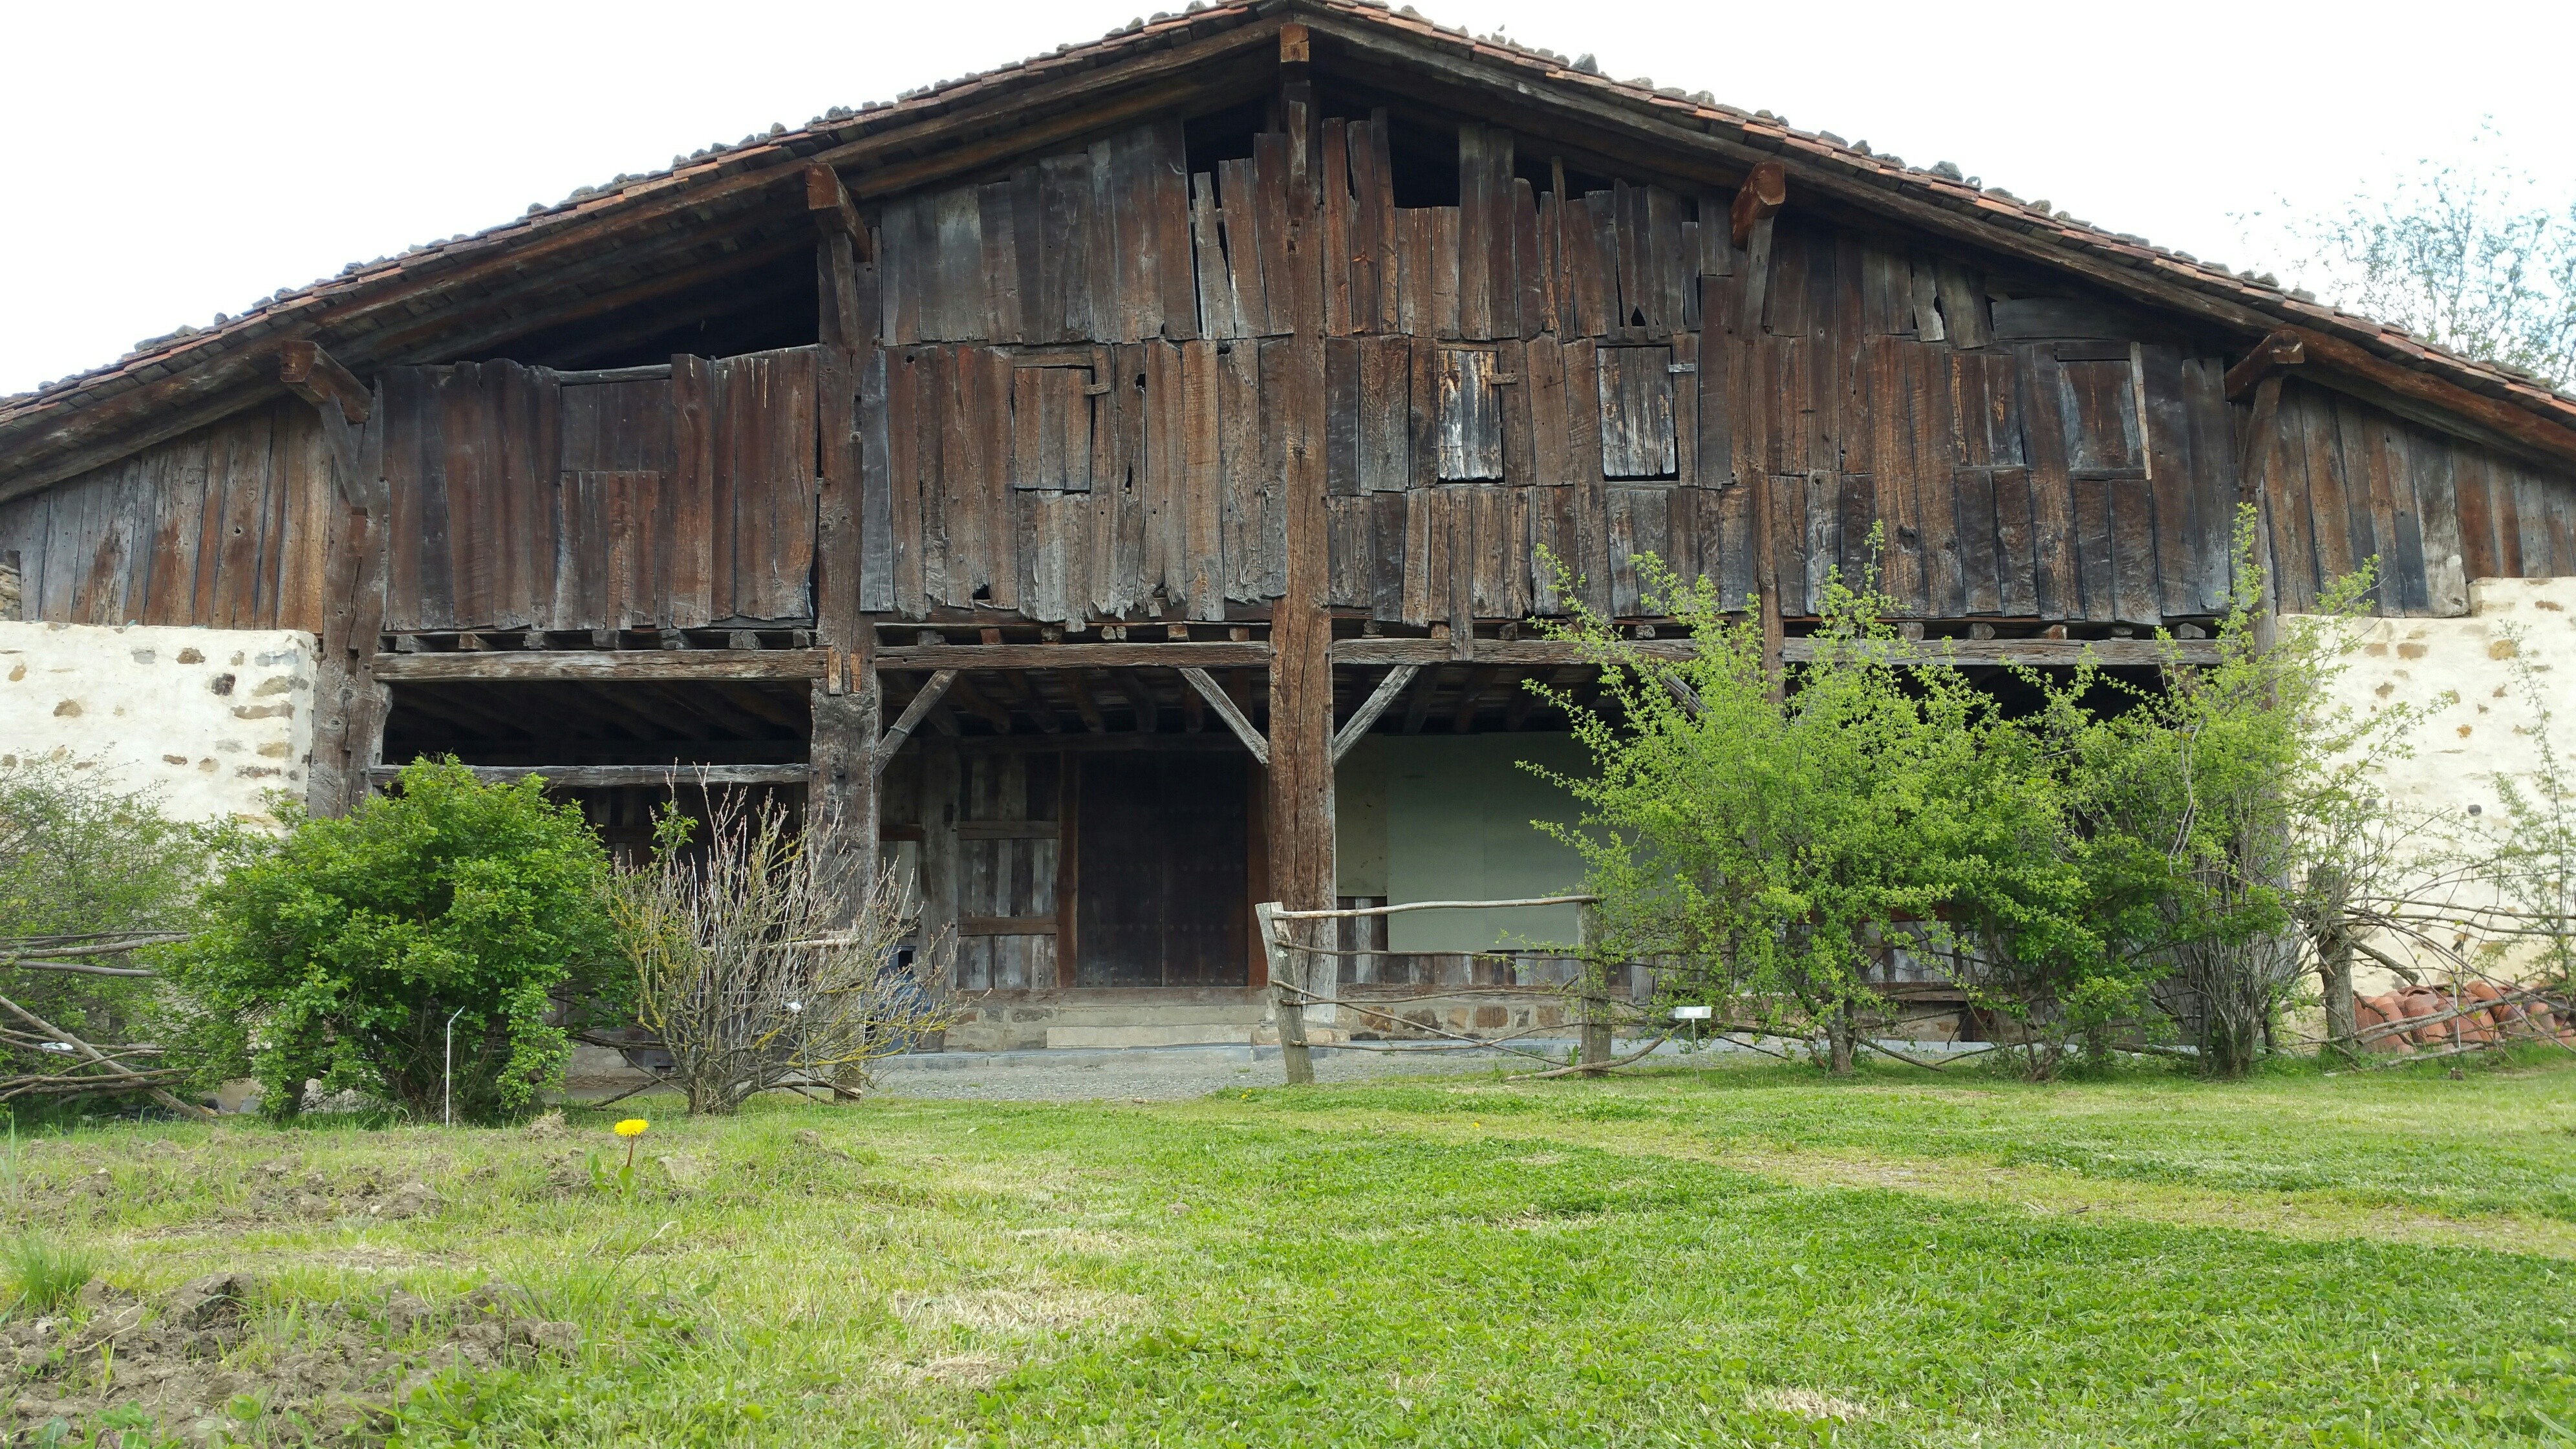 Caser o museo igartubeiti se or de los caser os vascos - Caserios pais vasco ...